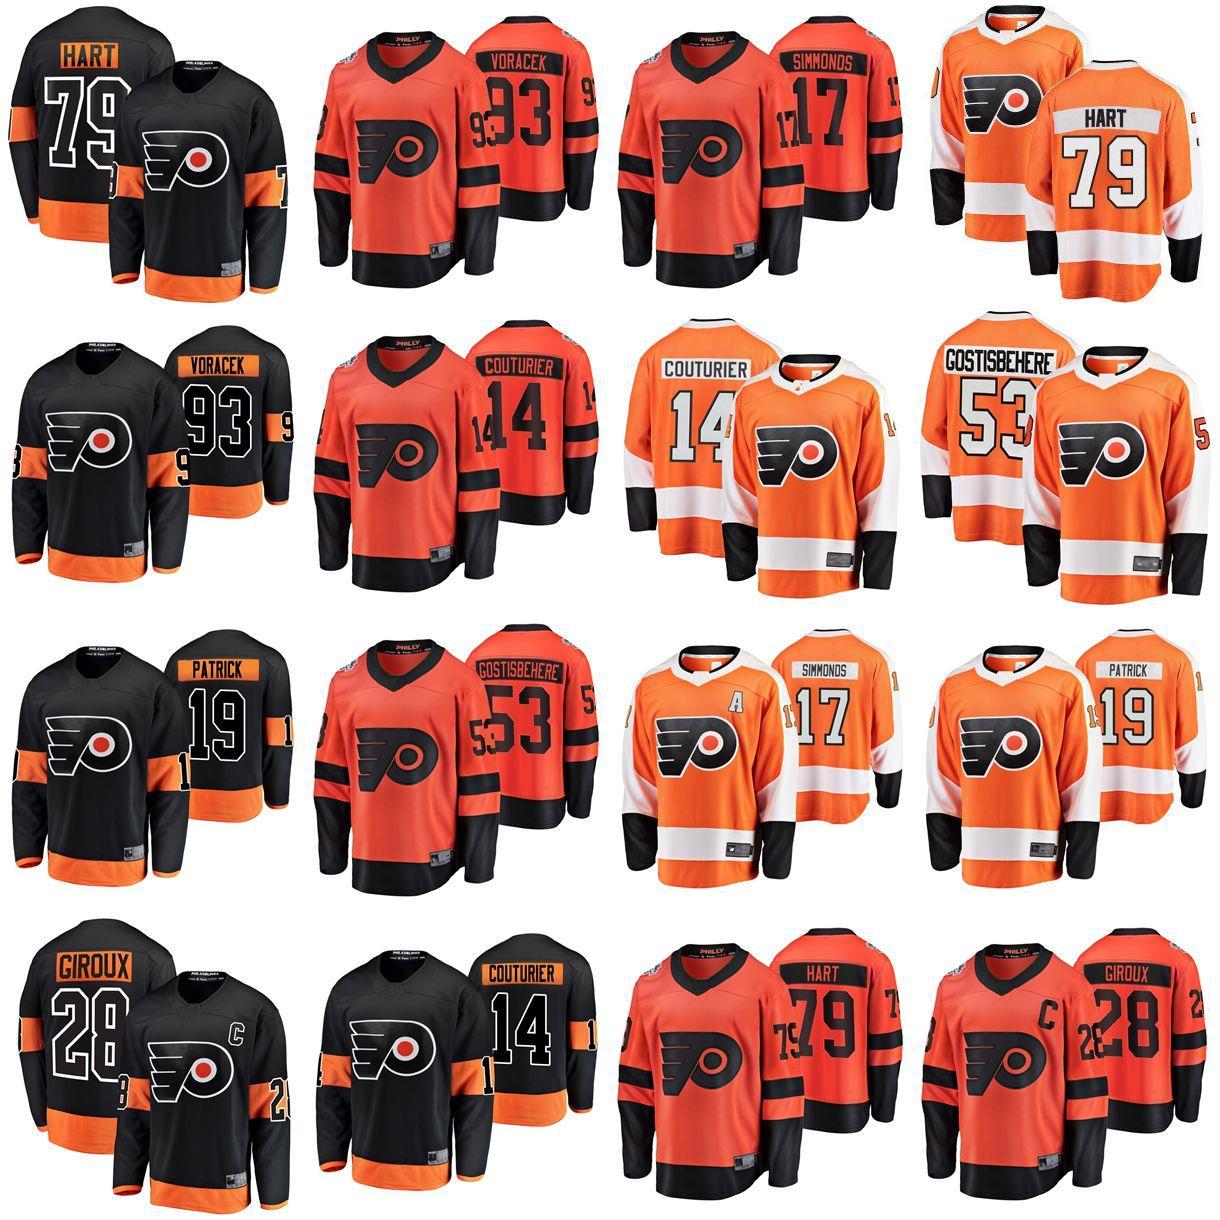 Philadelphia Flyers Jerseys Mens 28 Claude Giroux Jersey 19 Nolan Patrick 17 Wayne Simmonds 79 Carter Hart Womens Ice Hockey Jerseys Juventude